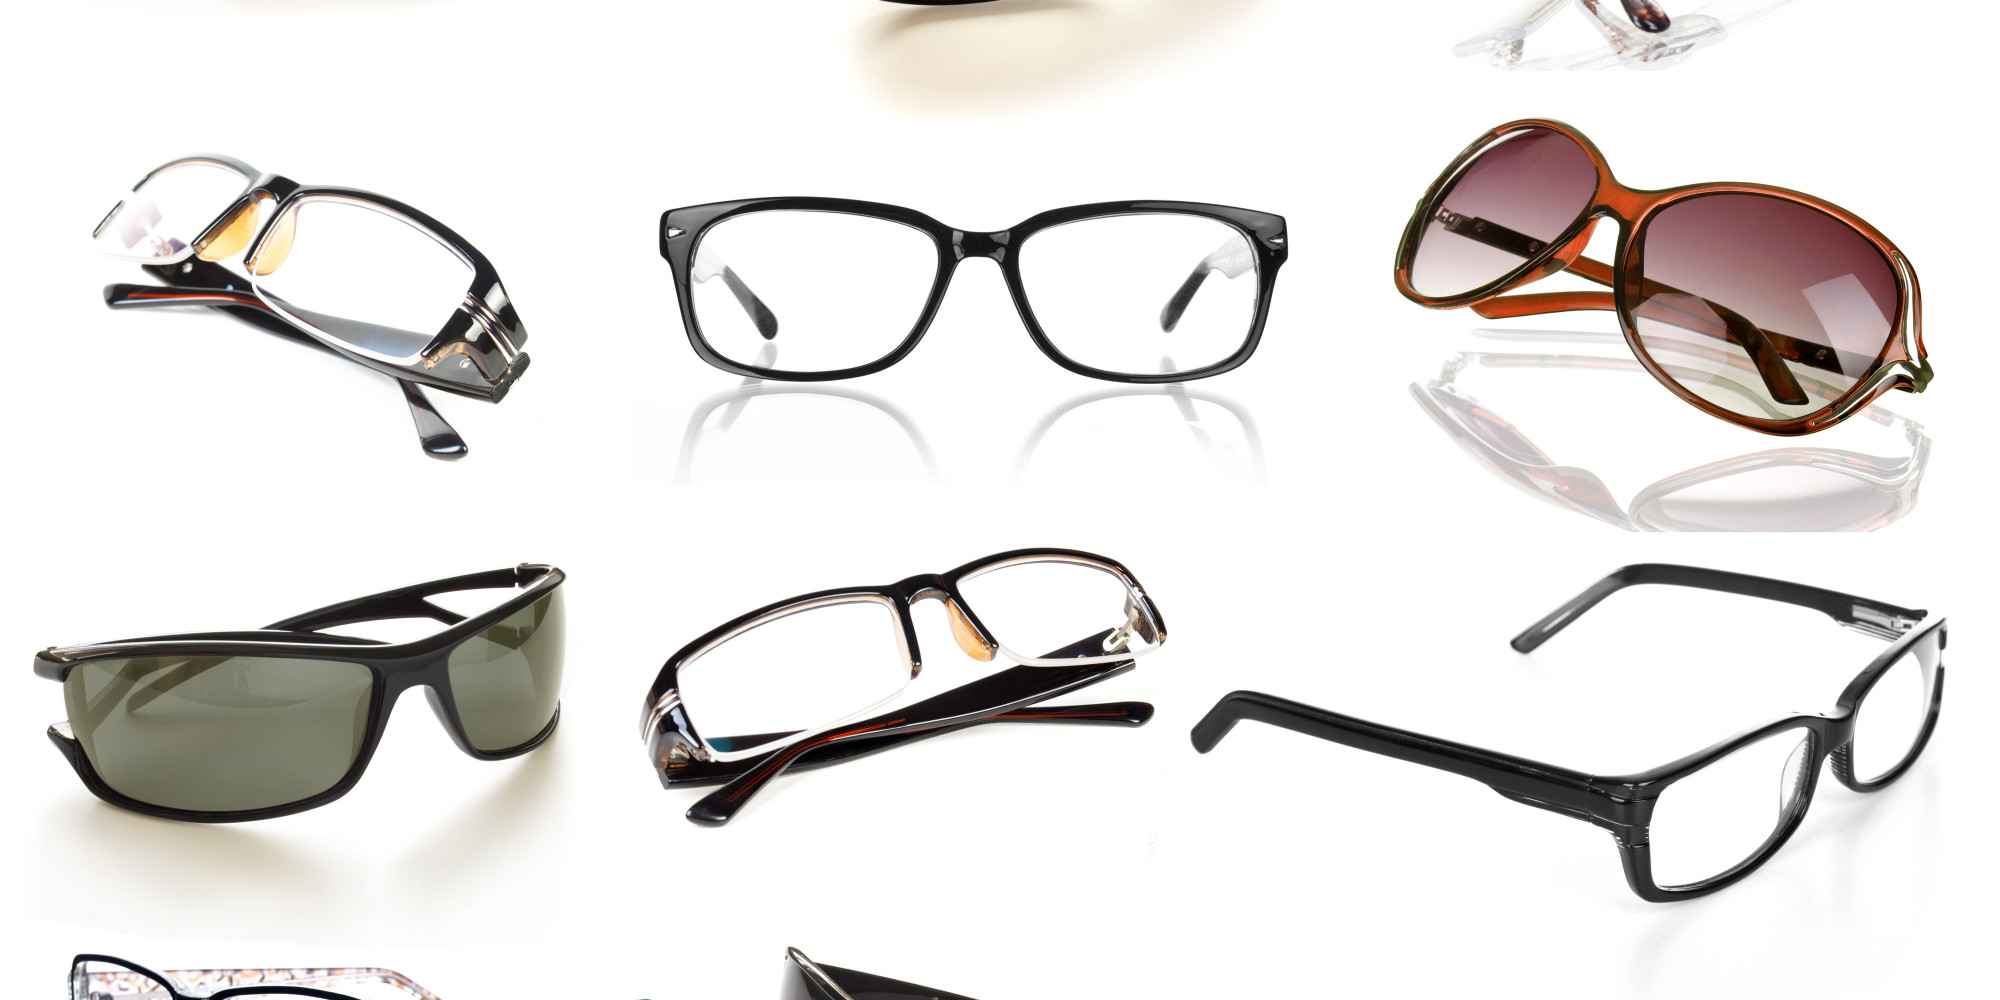 prix des lunettes l 39 ufc que choisir fustige les marges des opticiens. Black Bedroom Furniture Sets. Home Design Ideas